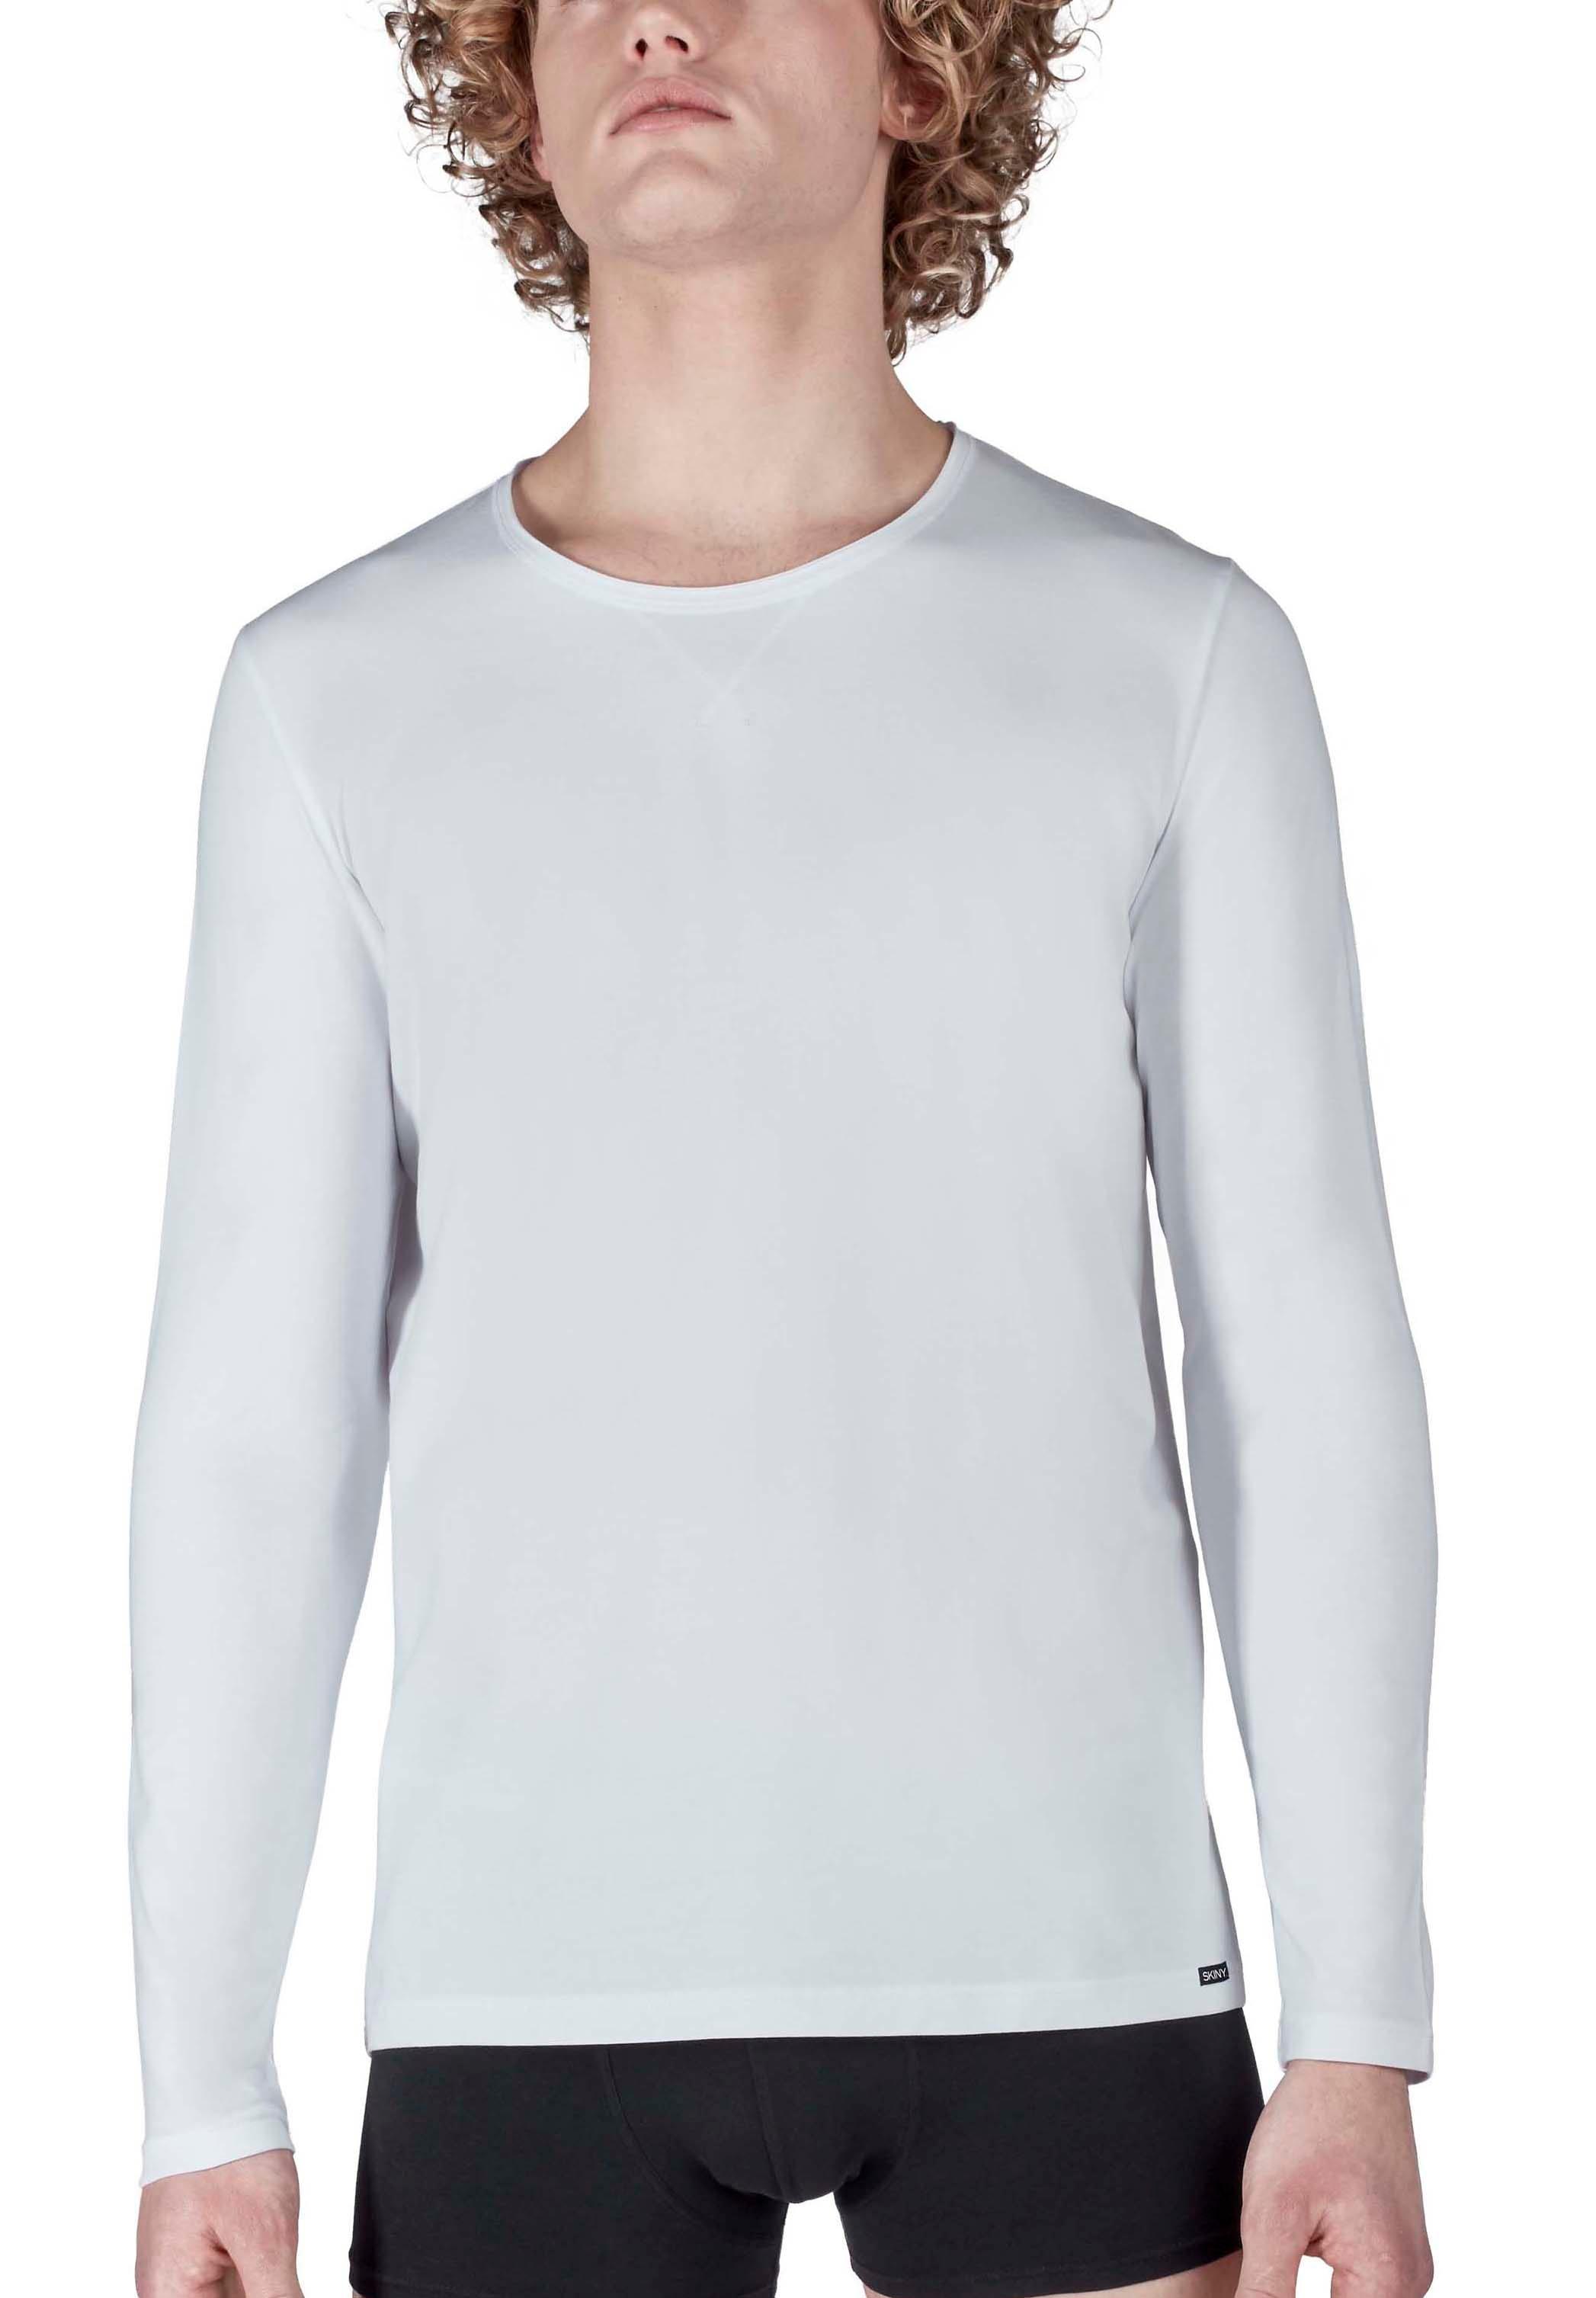 skiny -  Langarmshirt mit modernem X-Stitching